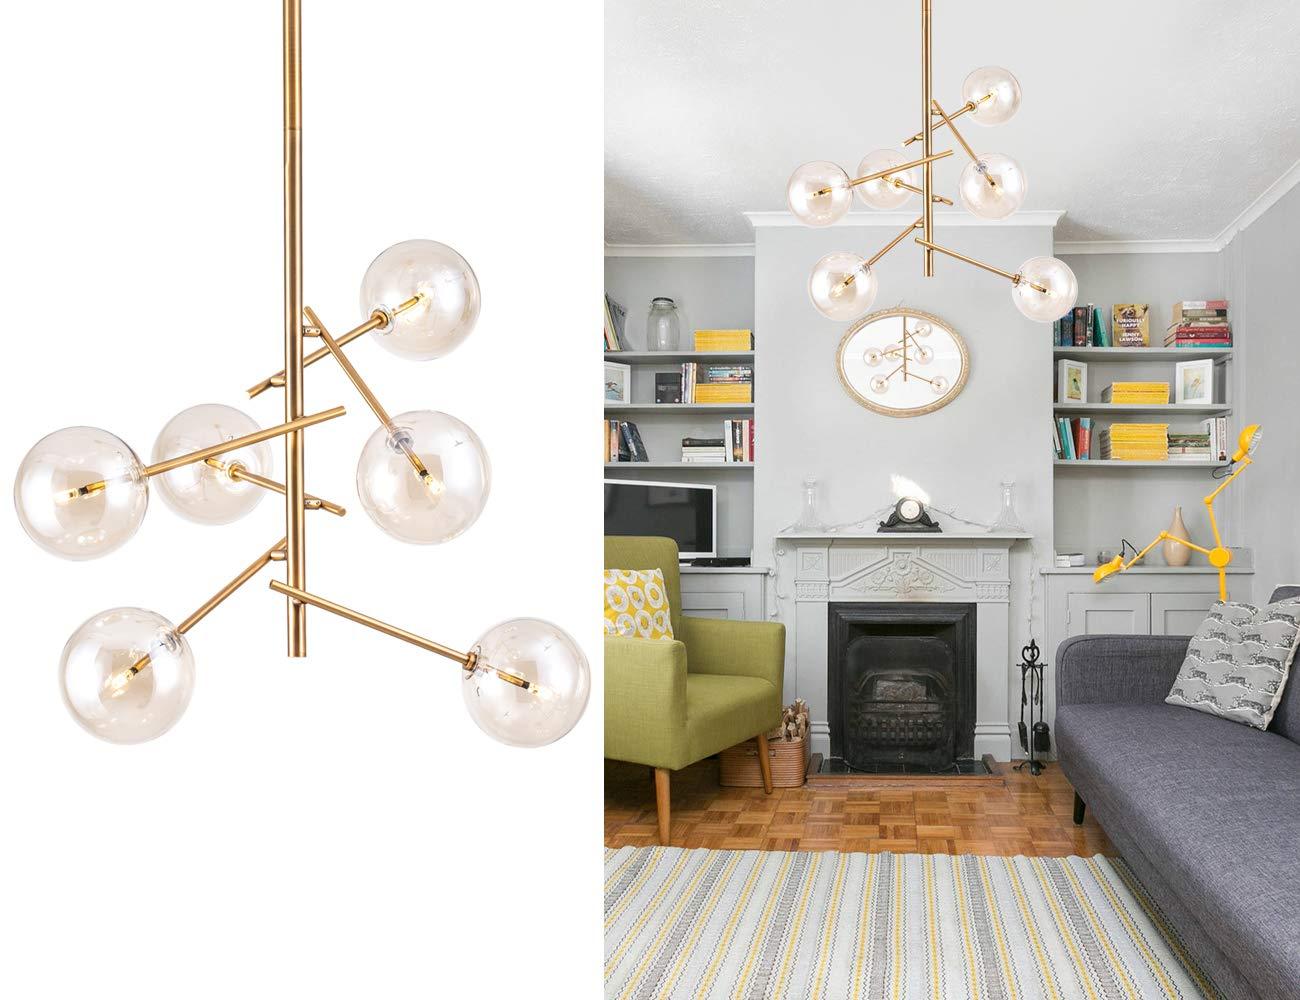 Modern Sputnik Chandelier 6 Lights Mid Century Brass Vintage Pendant Lighting Fixture for Foyer Dining Living Room Bedroom by Bewamf